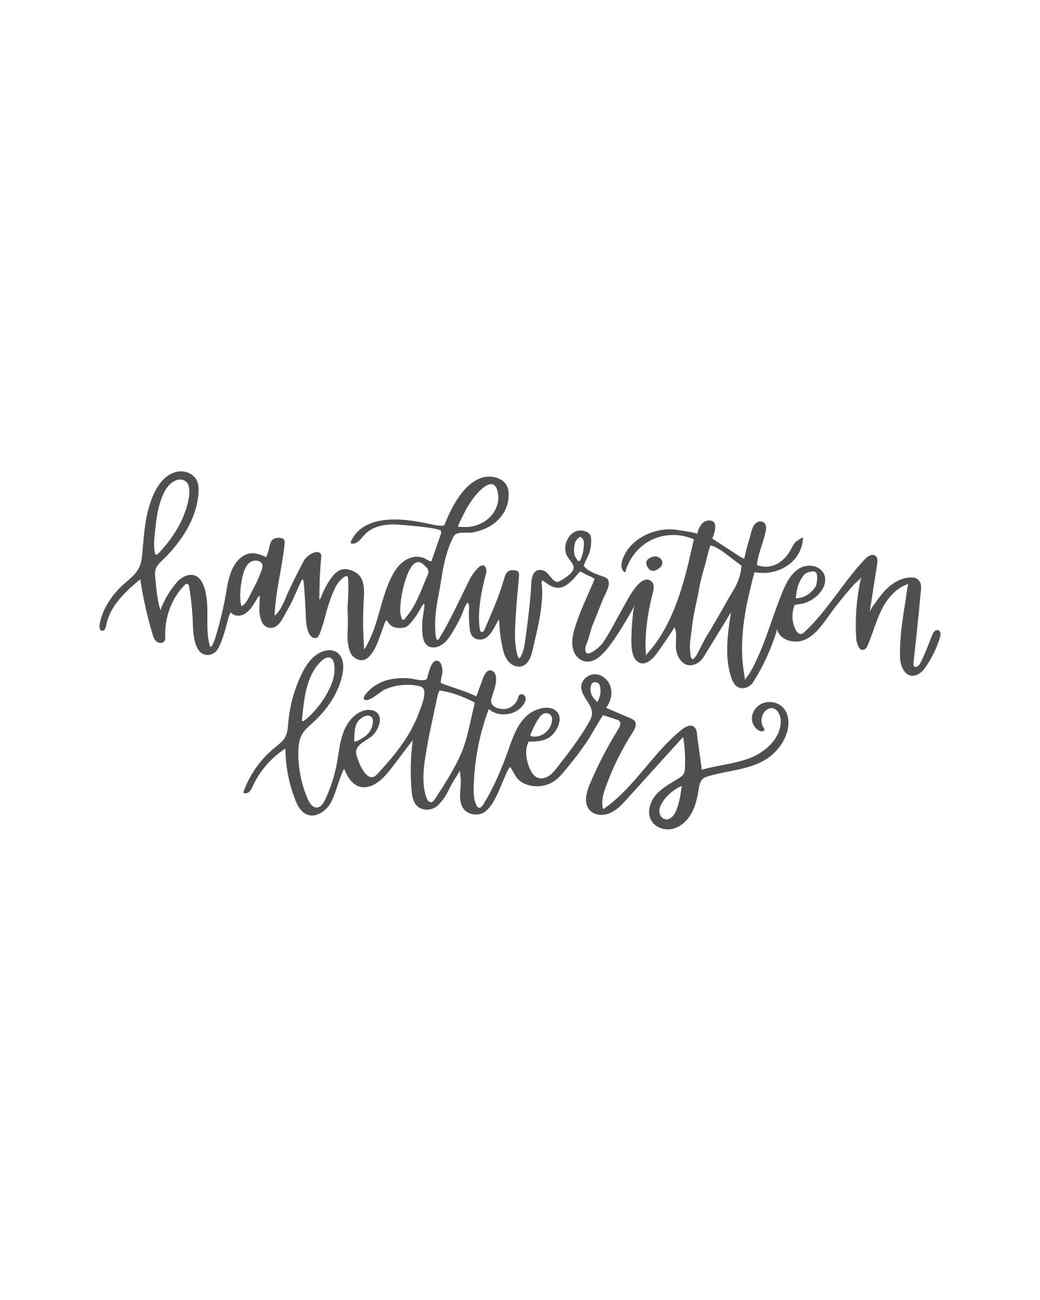 """handwritten letters"" in calligraphy"